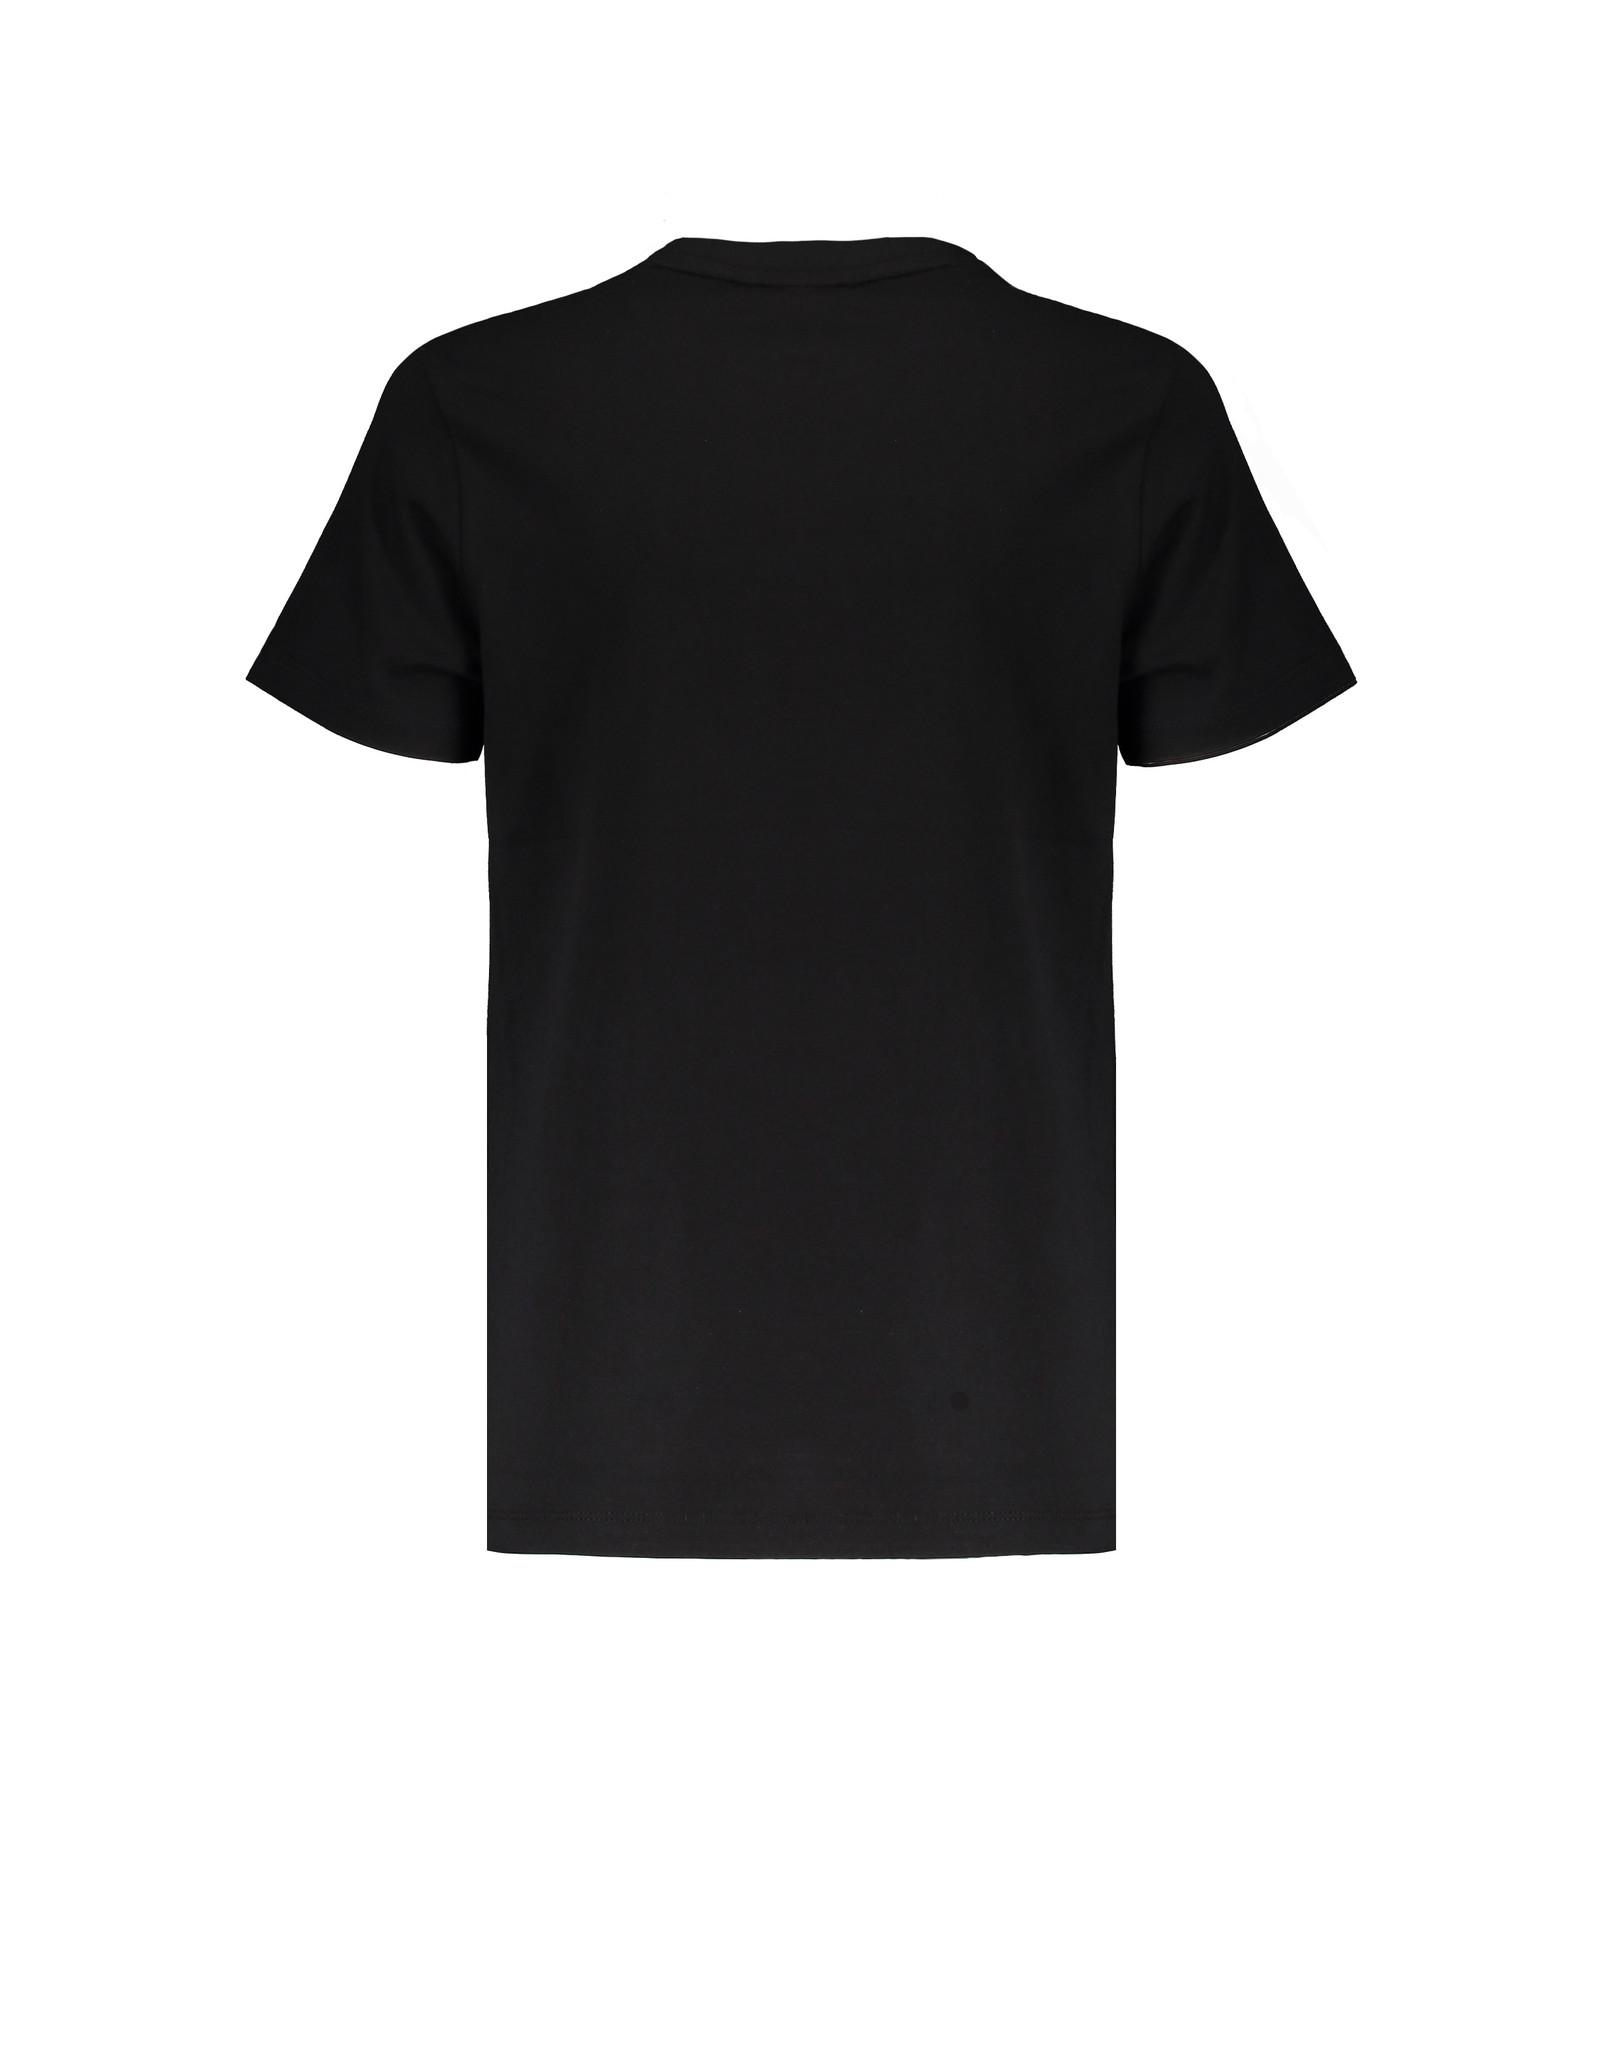 Bellaire Kurt shortsleeves T-shirt + KunC C